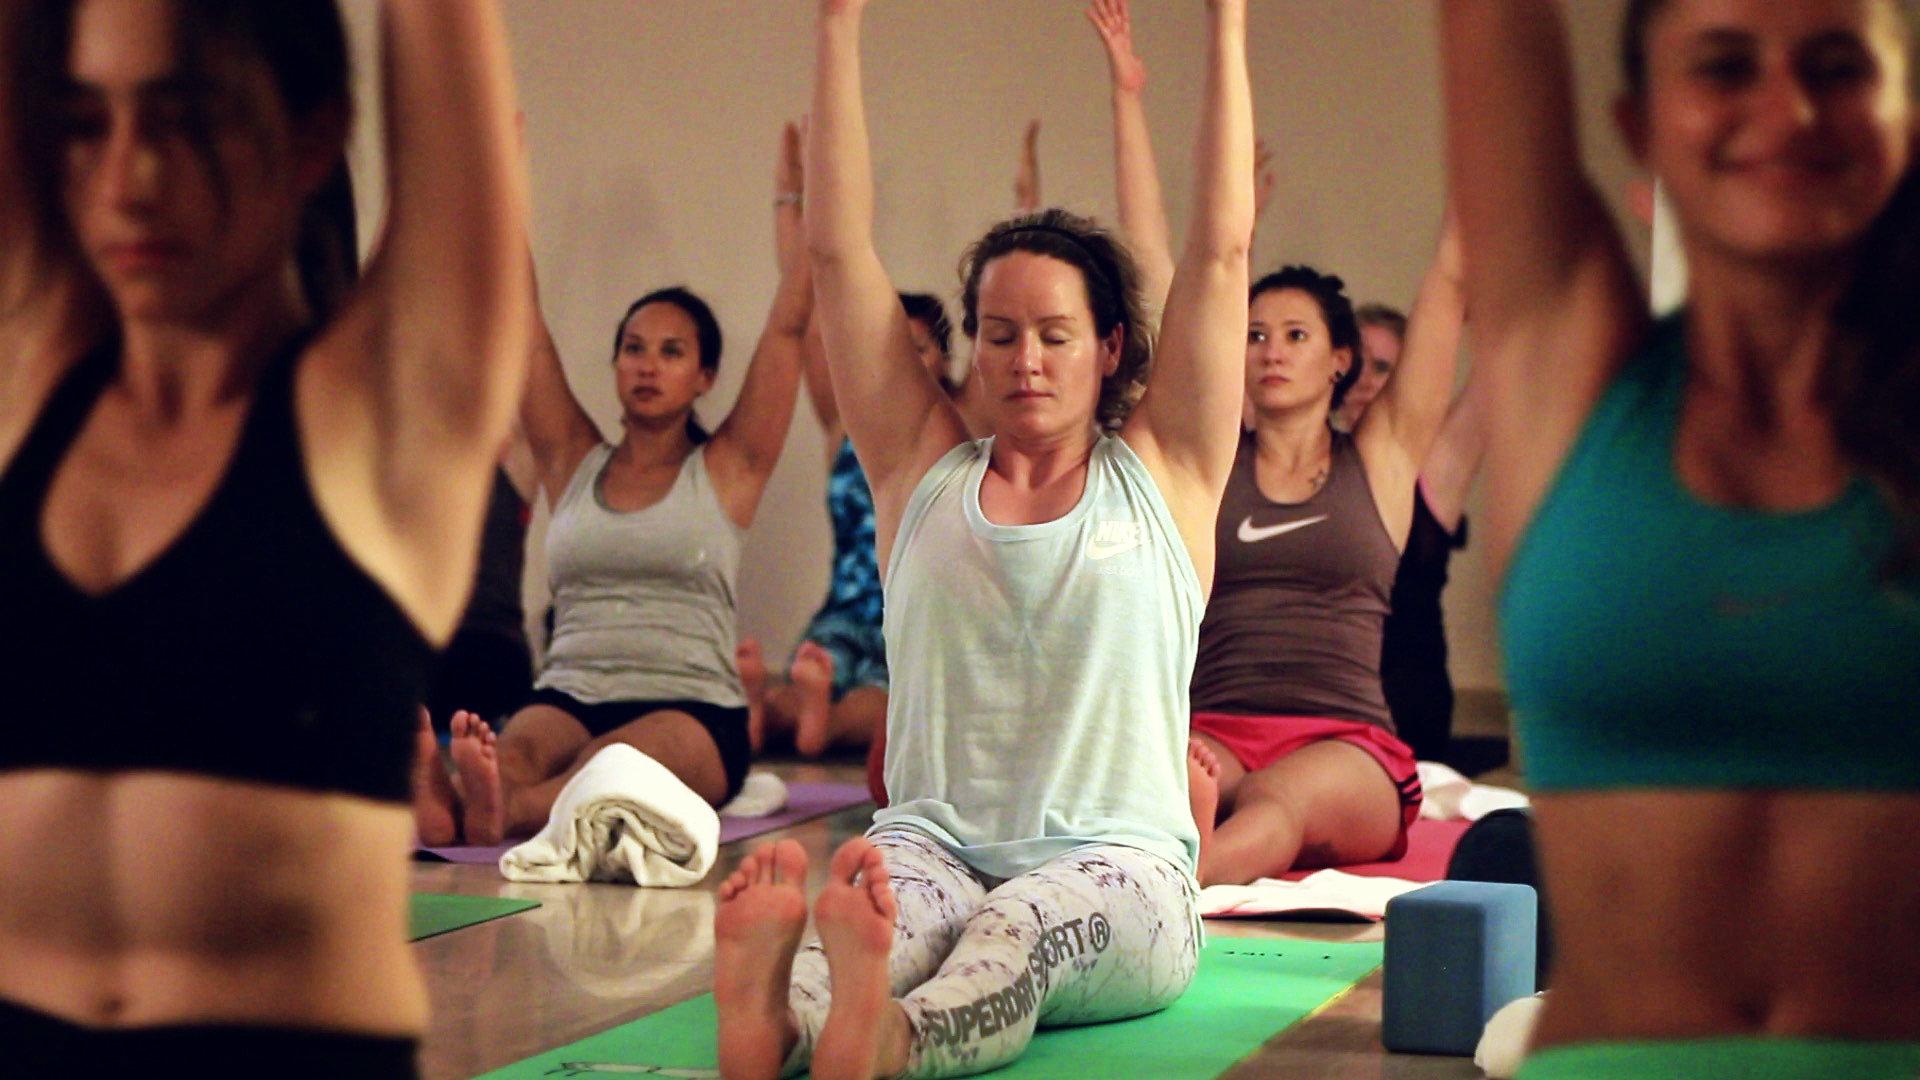 patreon take 2 yogis effect.jpg